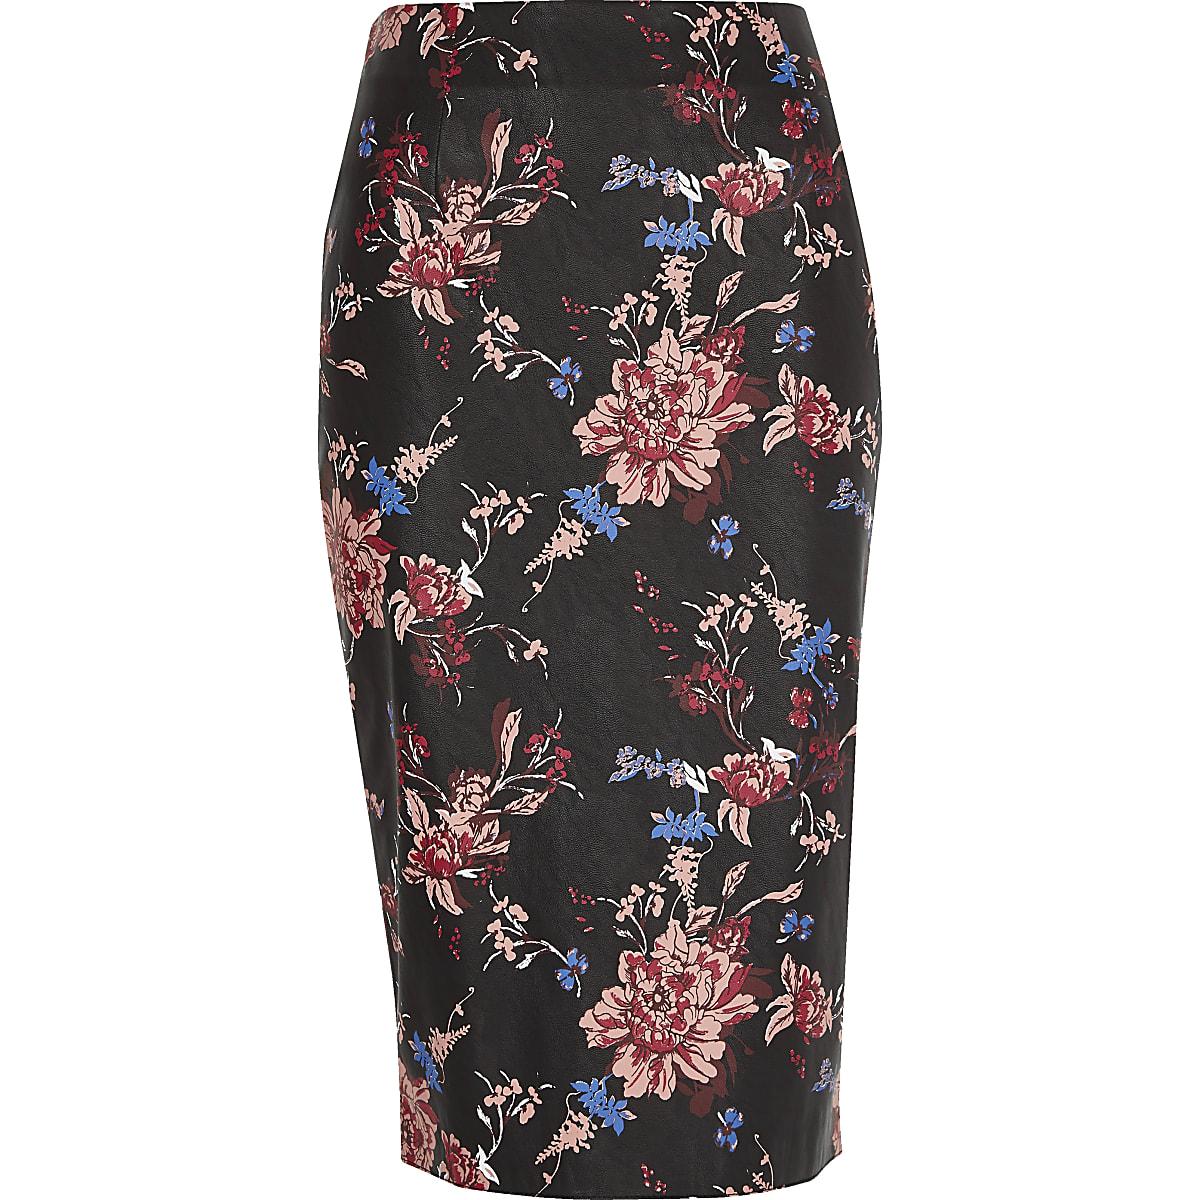 3932fe9b091f River Island Black Faux Leather Floral Print Pencil Skirt